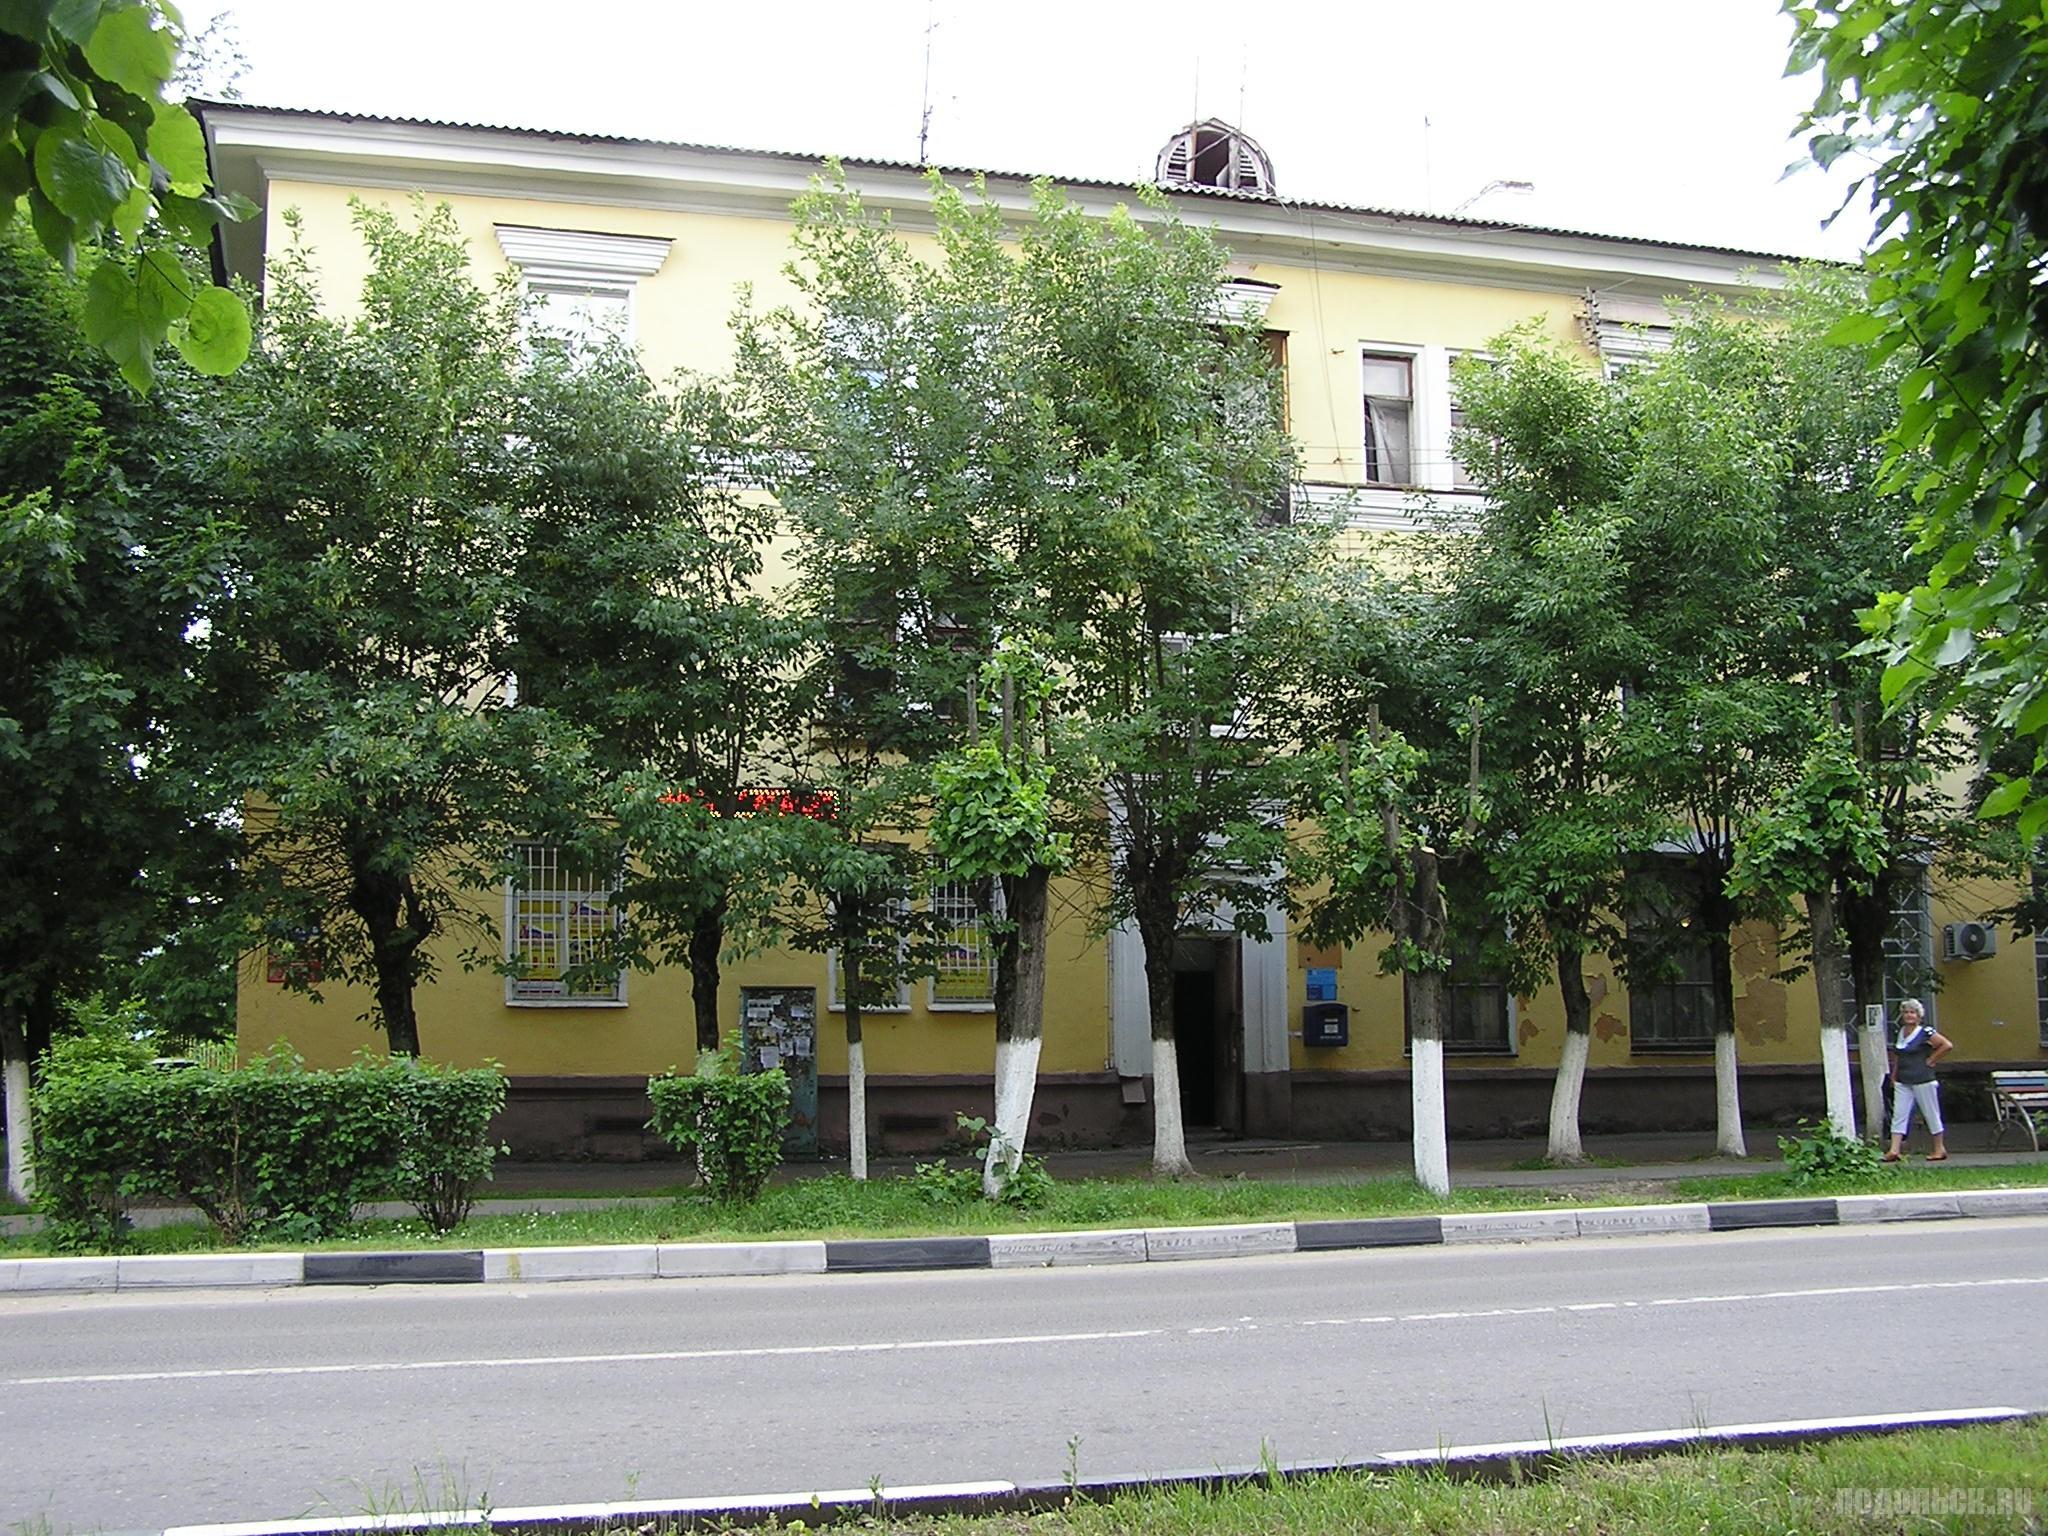 Улица Горького. 27 июня 2016 г.